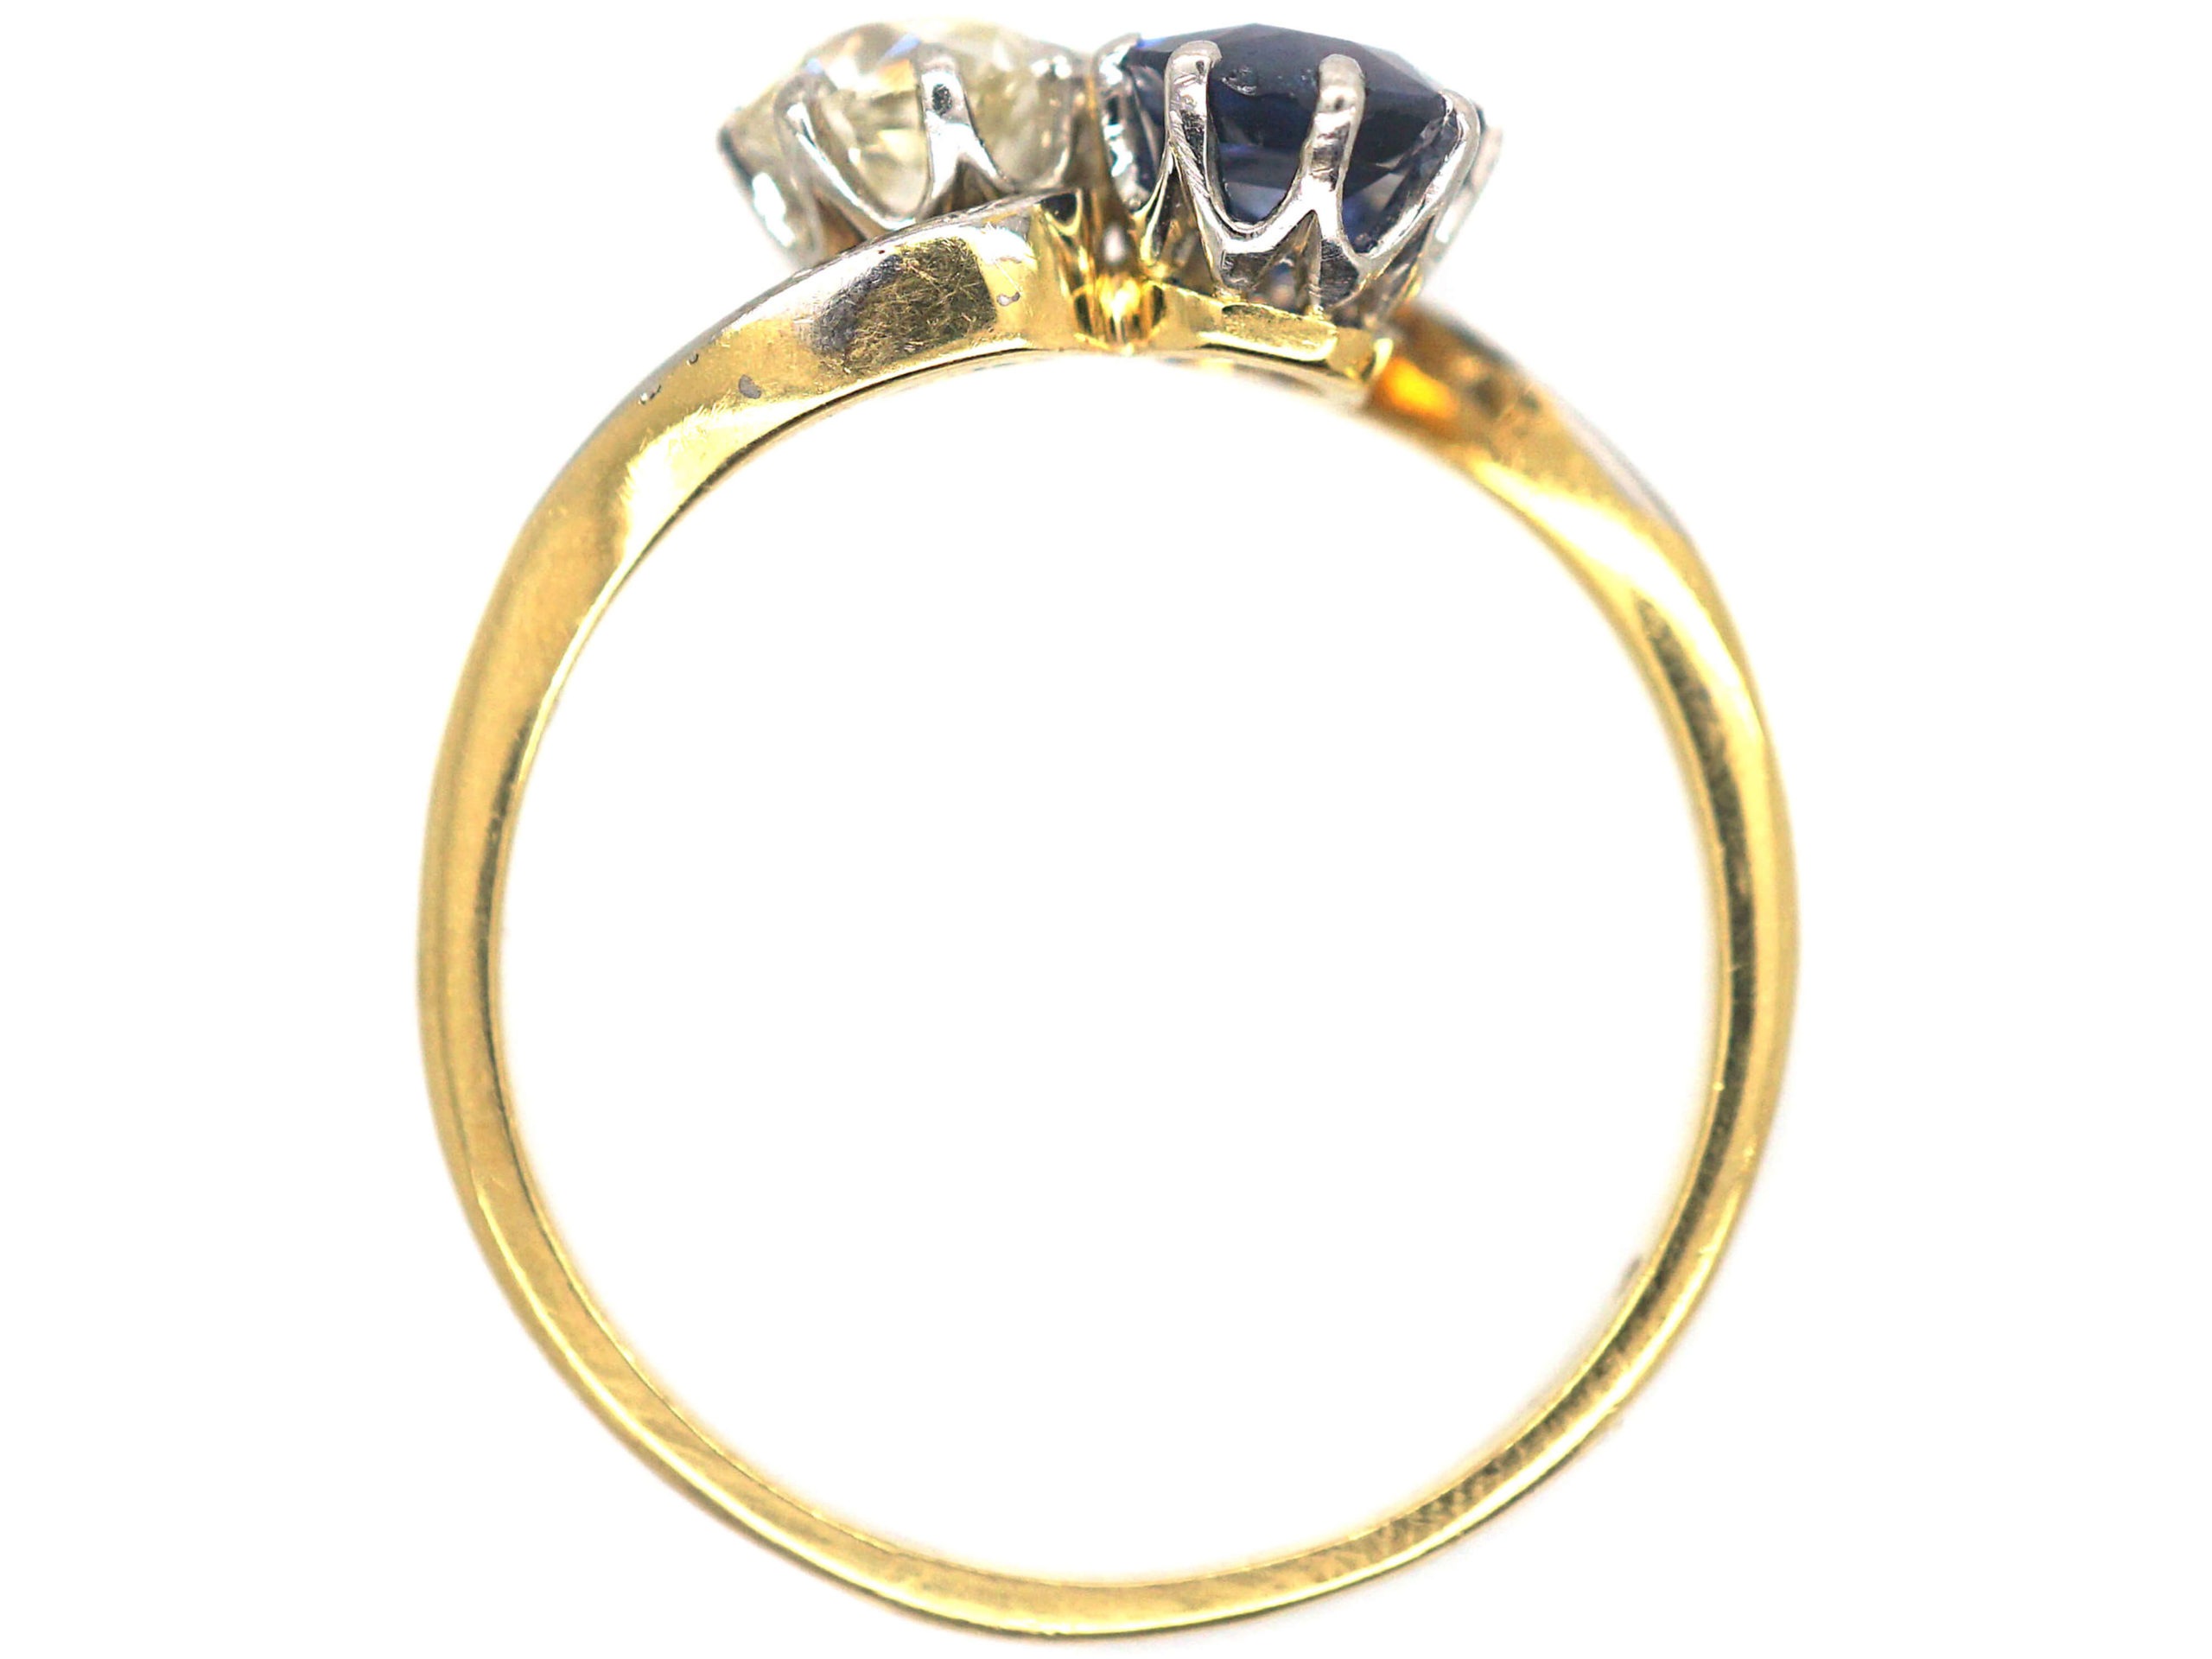 Edwardian 18ct Gold & Platinum Sapphire & Diamond Crossover Ring